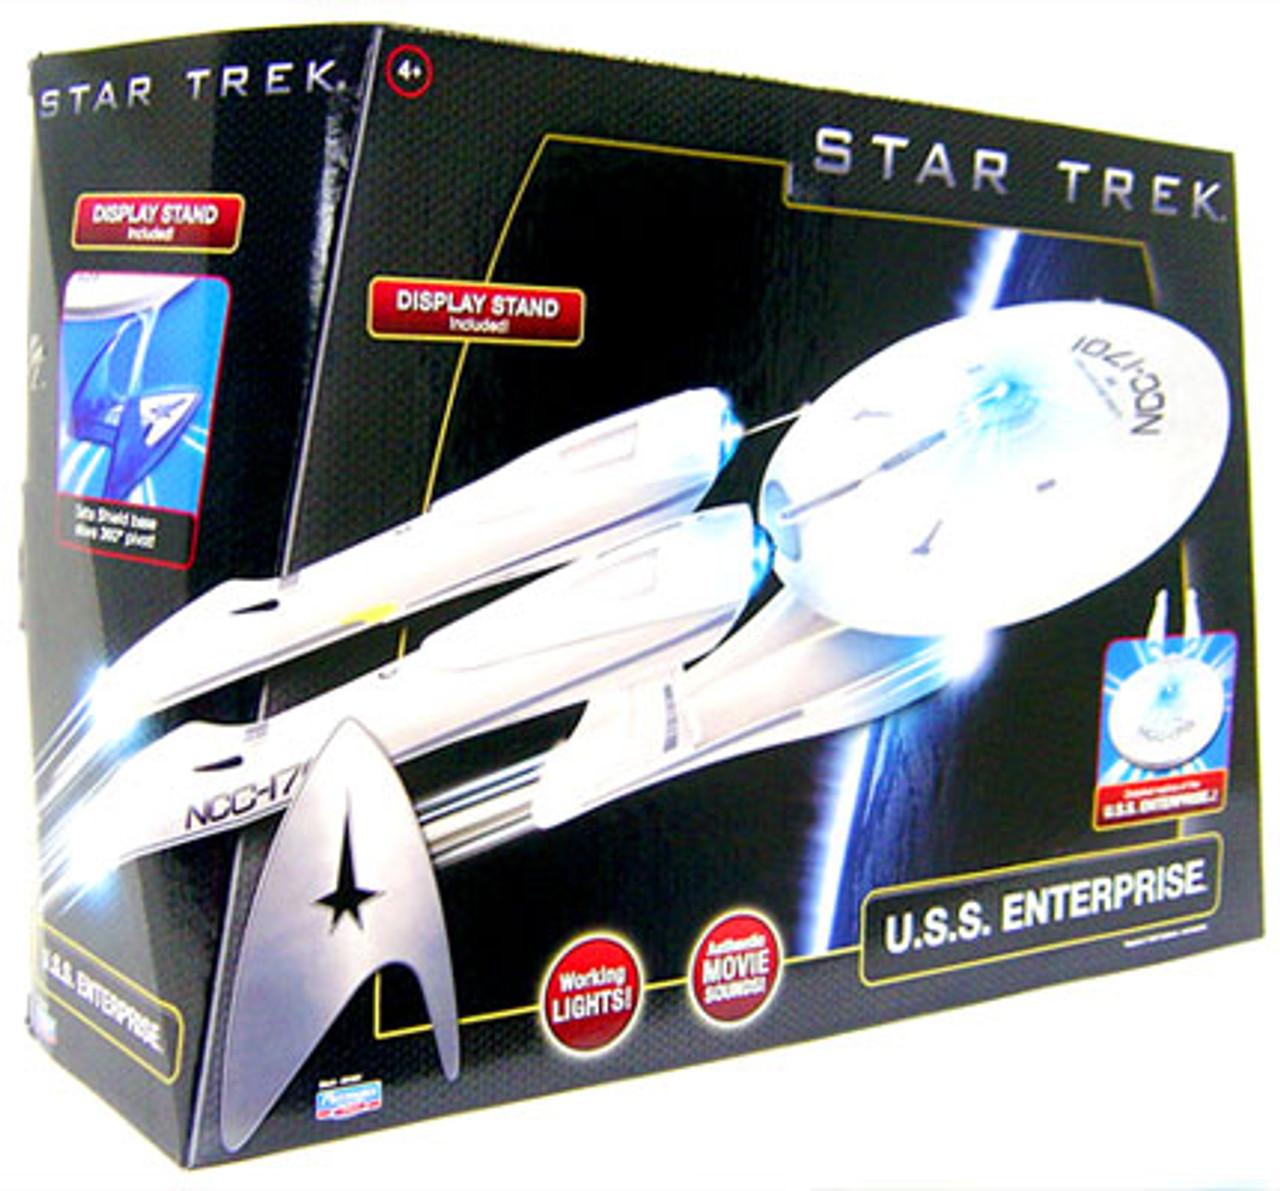 Star Trek 2009 Movie U.S.S. Enterprise